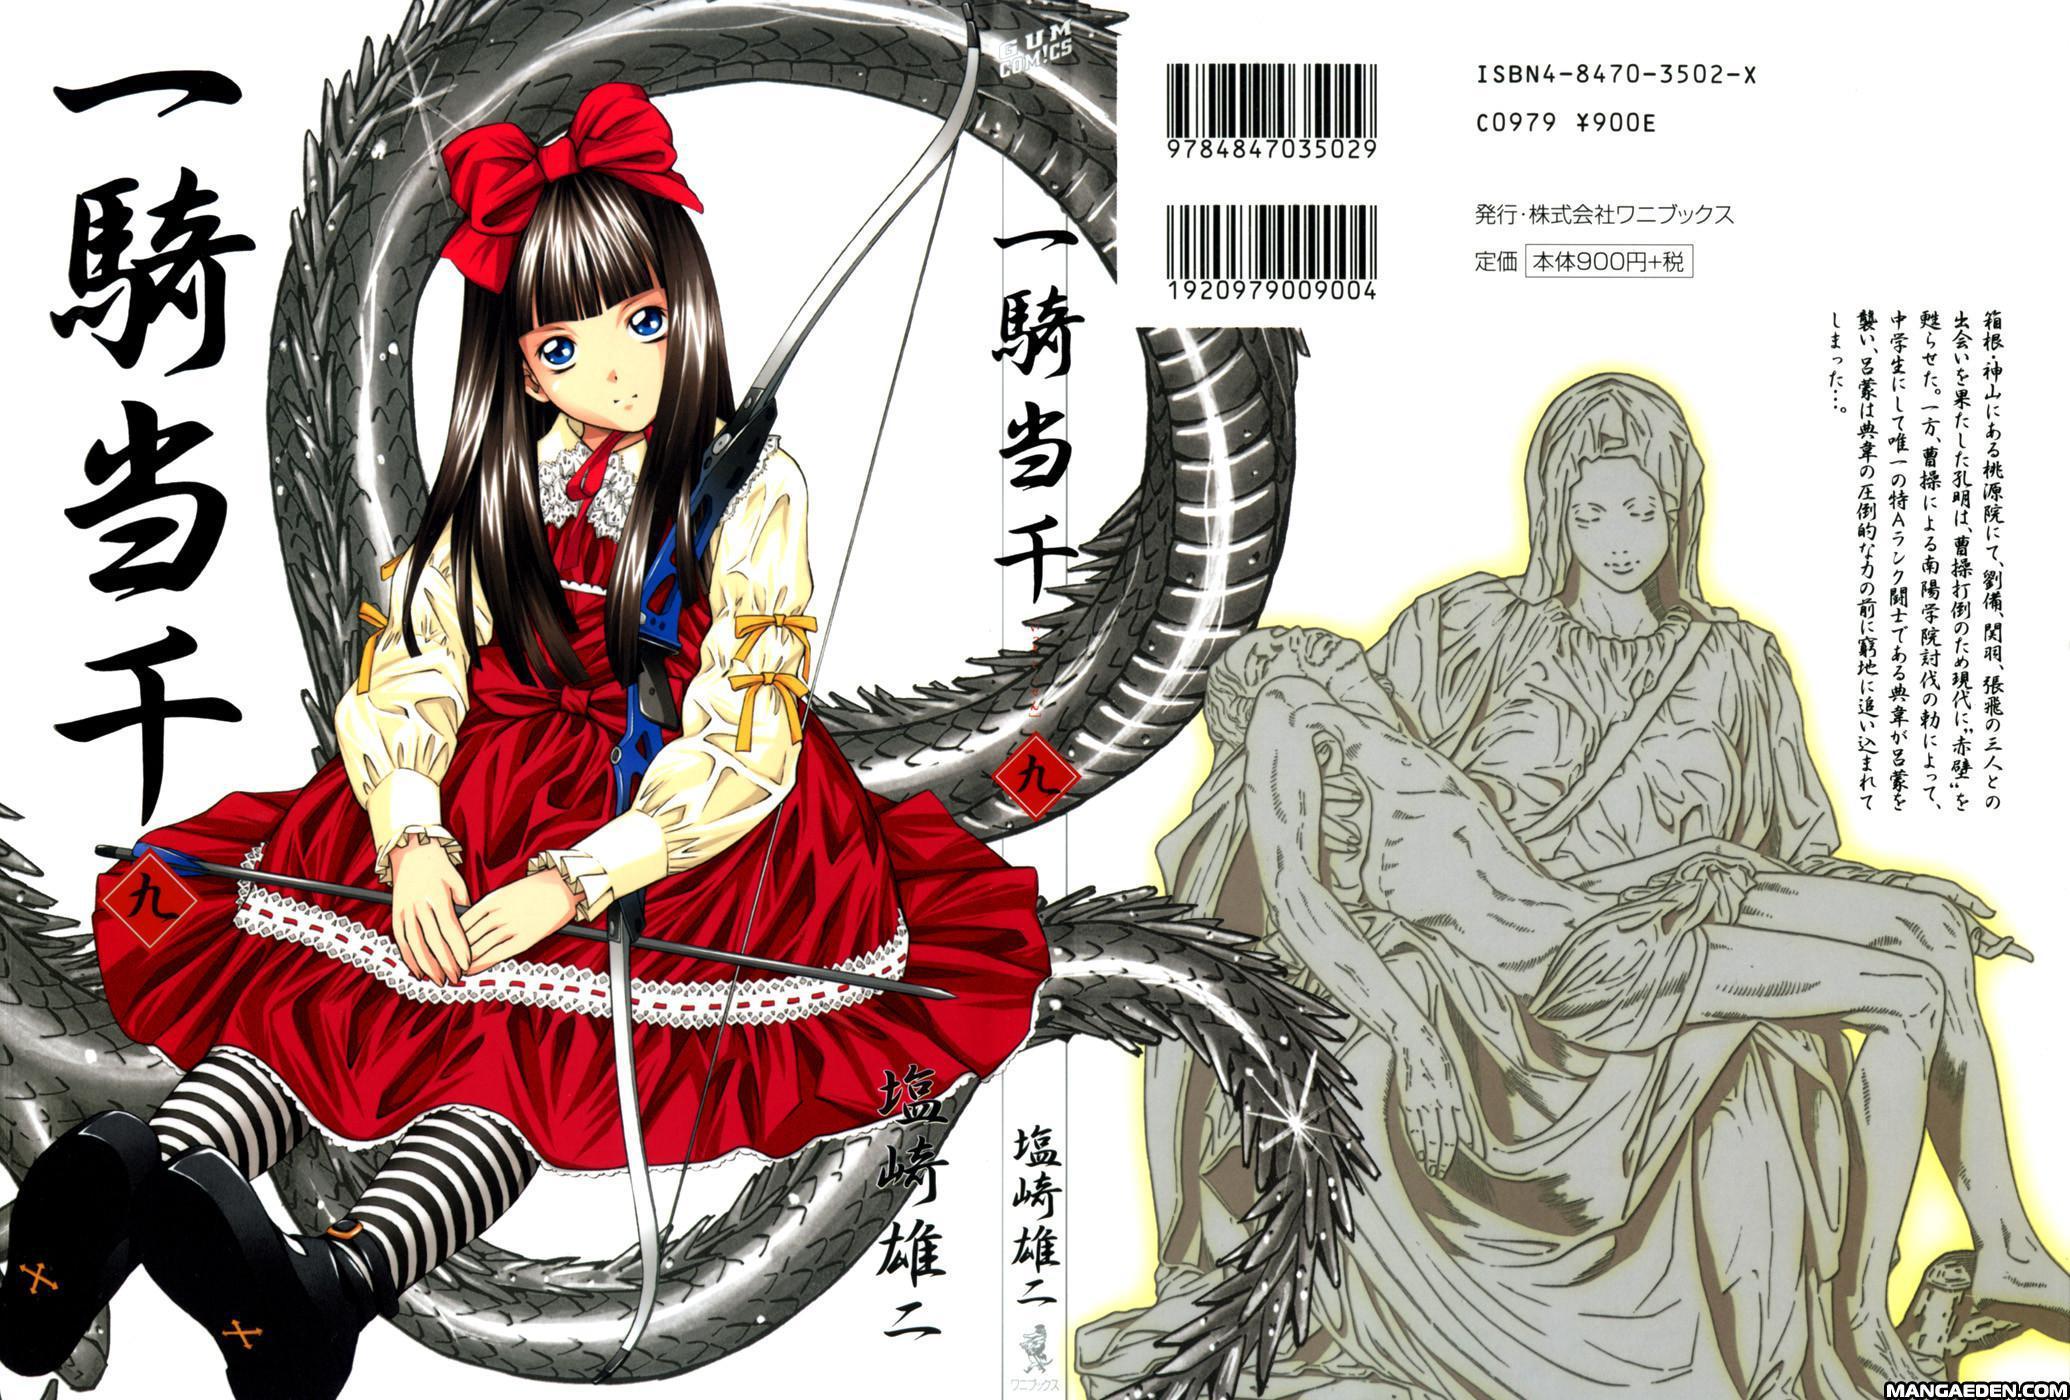 Ikkitousen ikki tousen-battle vixens                    59 page 1 at www.Mangago.com